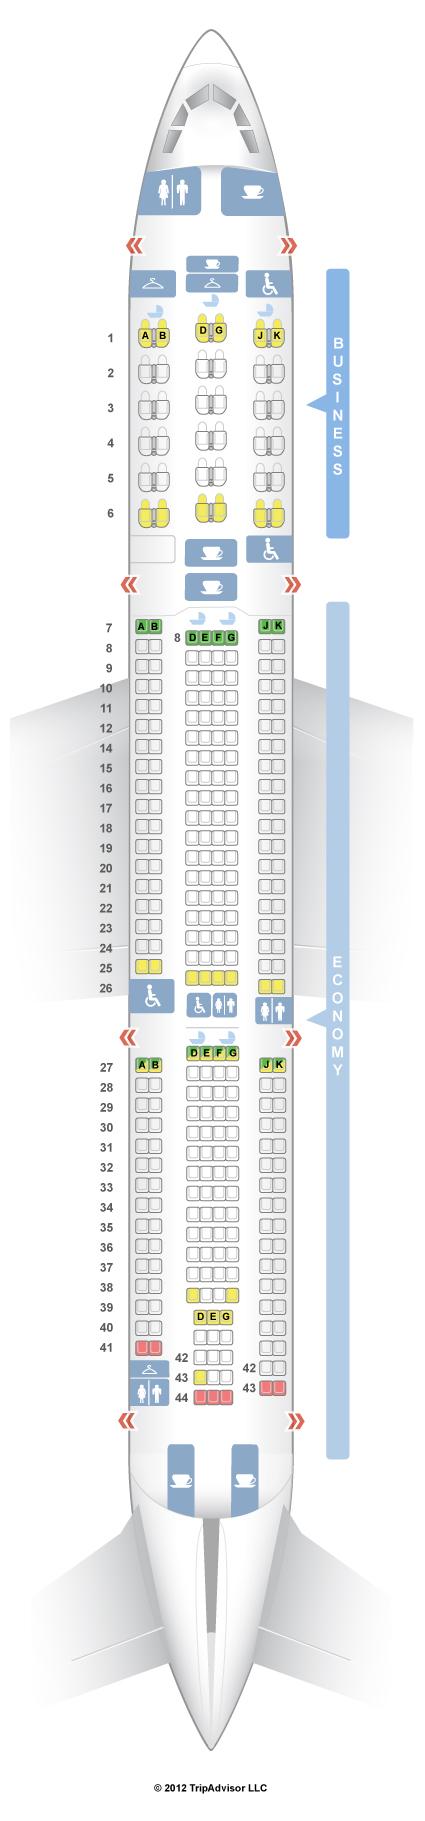 cathay pacific 333 seat map Seatguru Seat Map China Airlines Seatguru cathay pacific 333 seat map